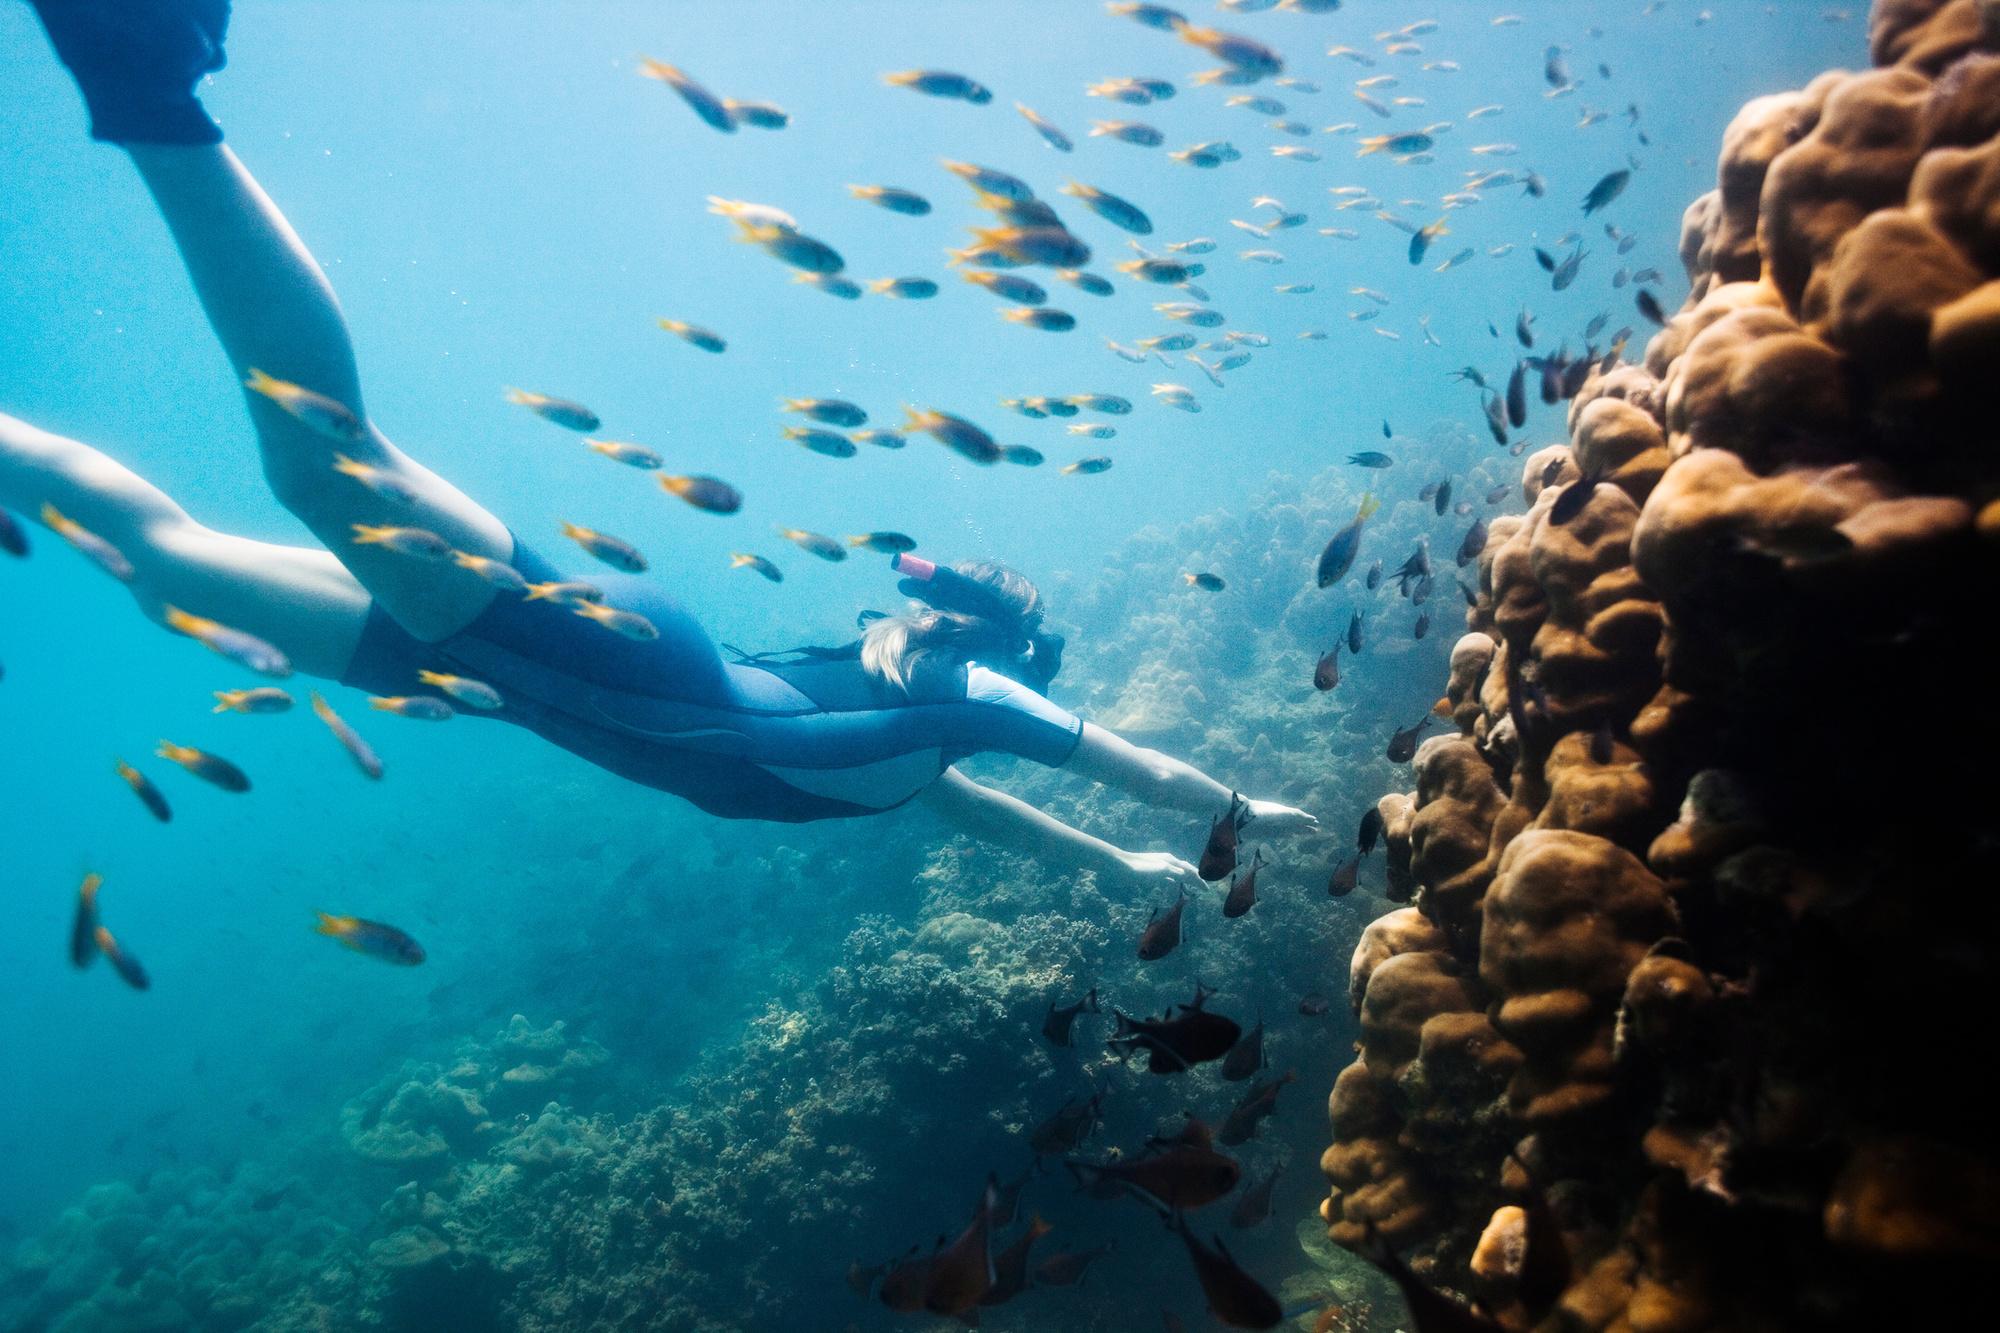 Plongée sous-marine à Koh Tao, Getty